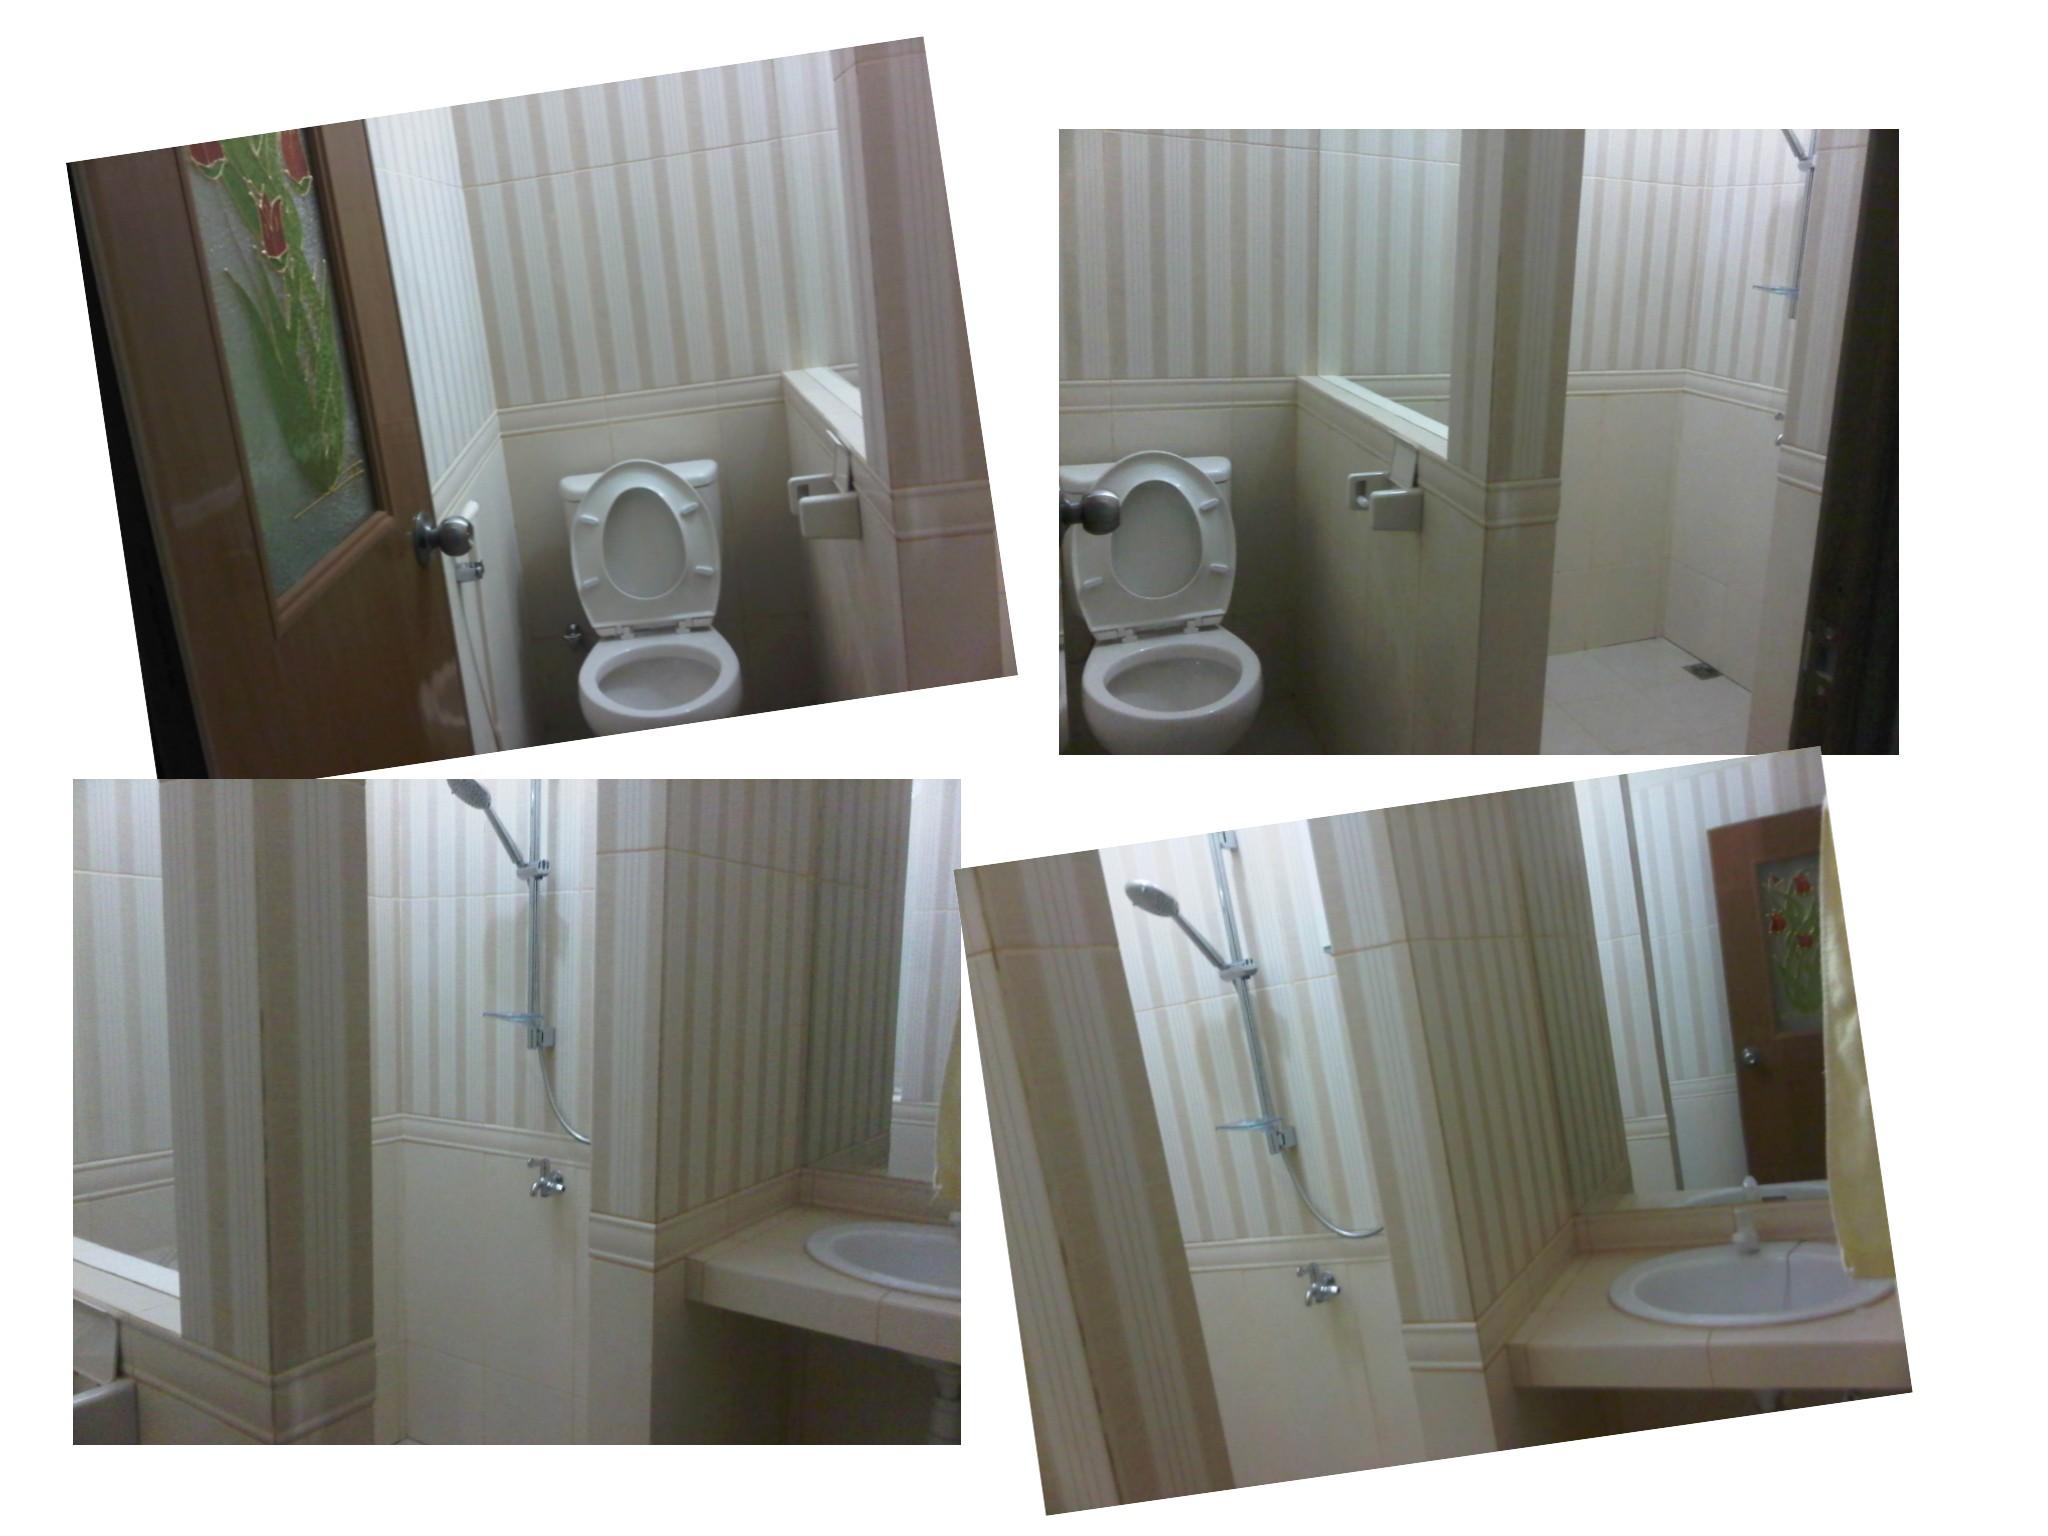 Model Pintu Pvc Untuk Kamar Mandi